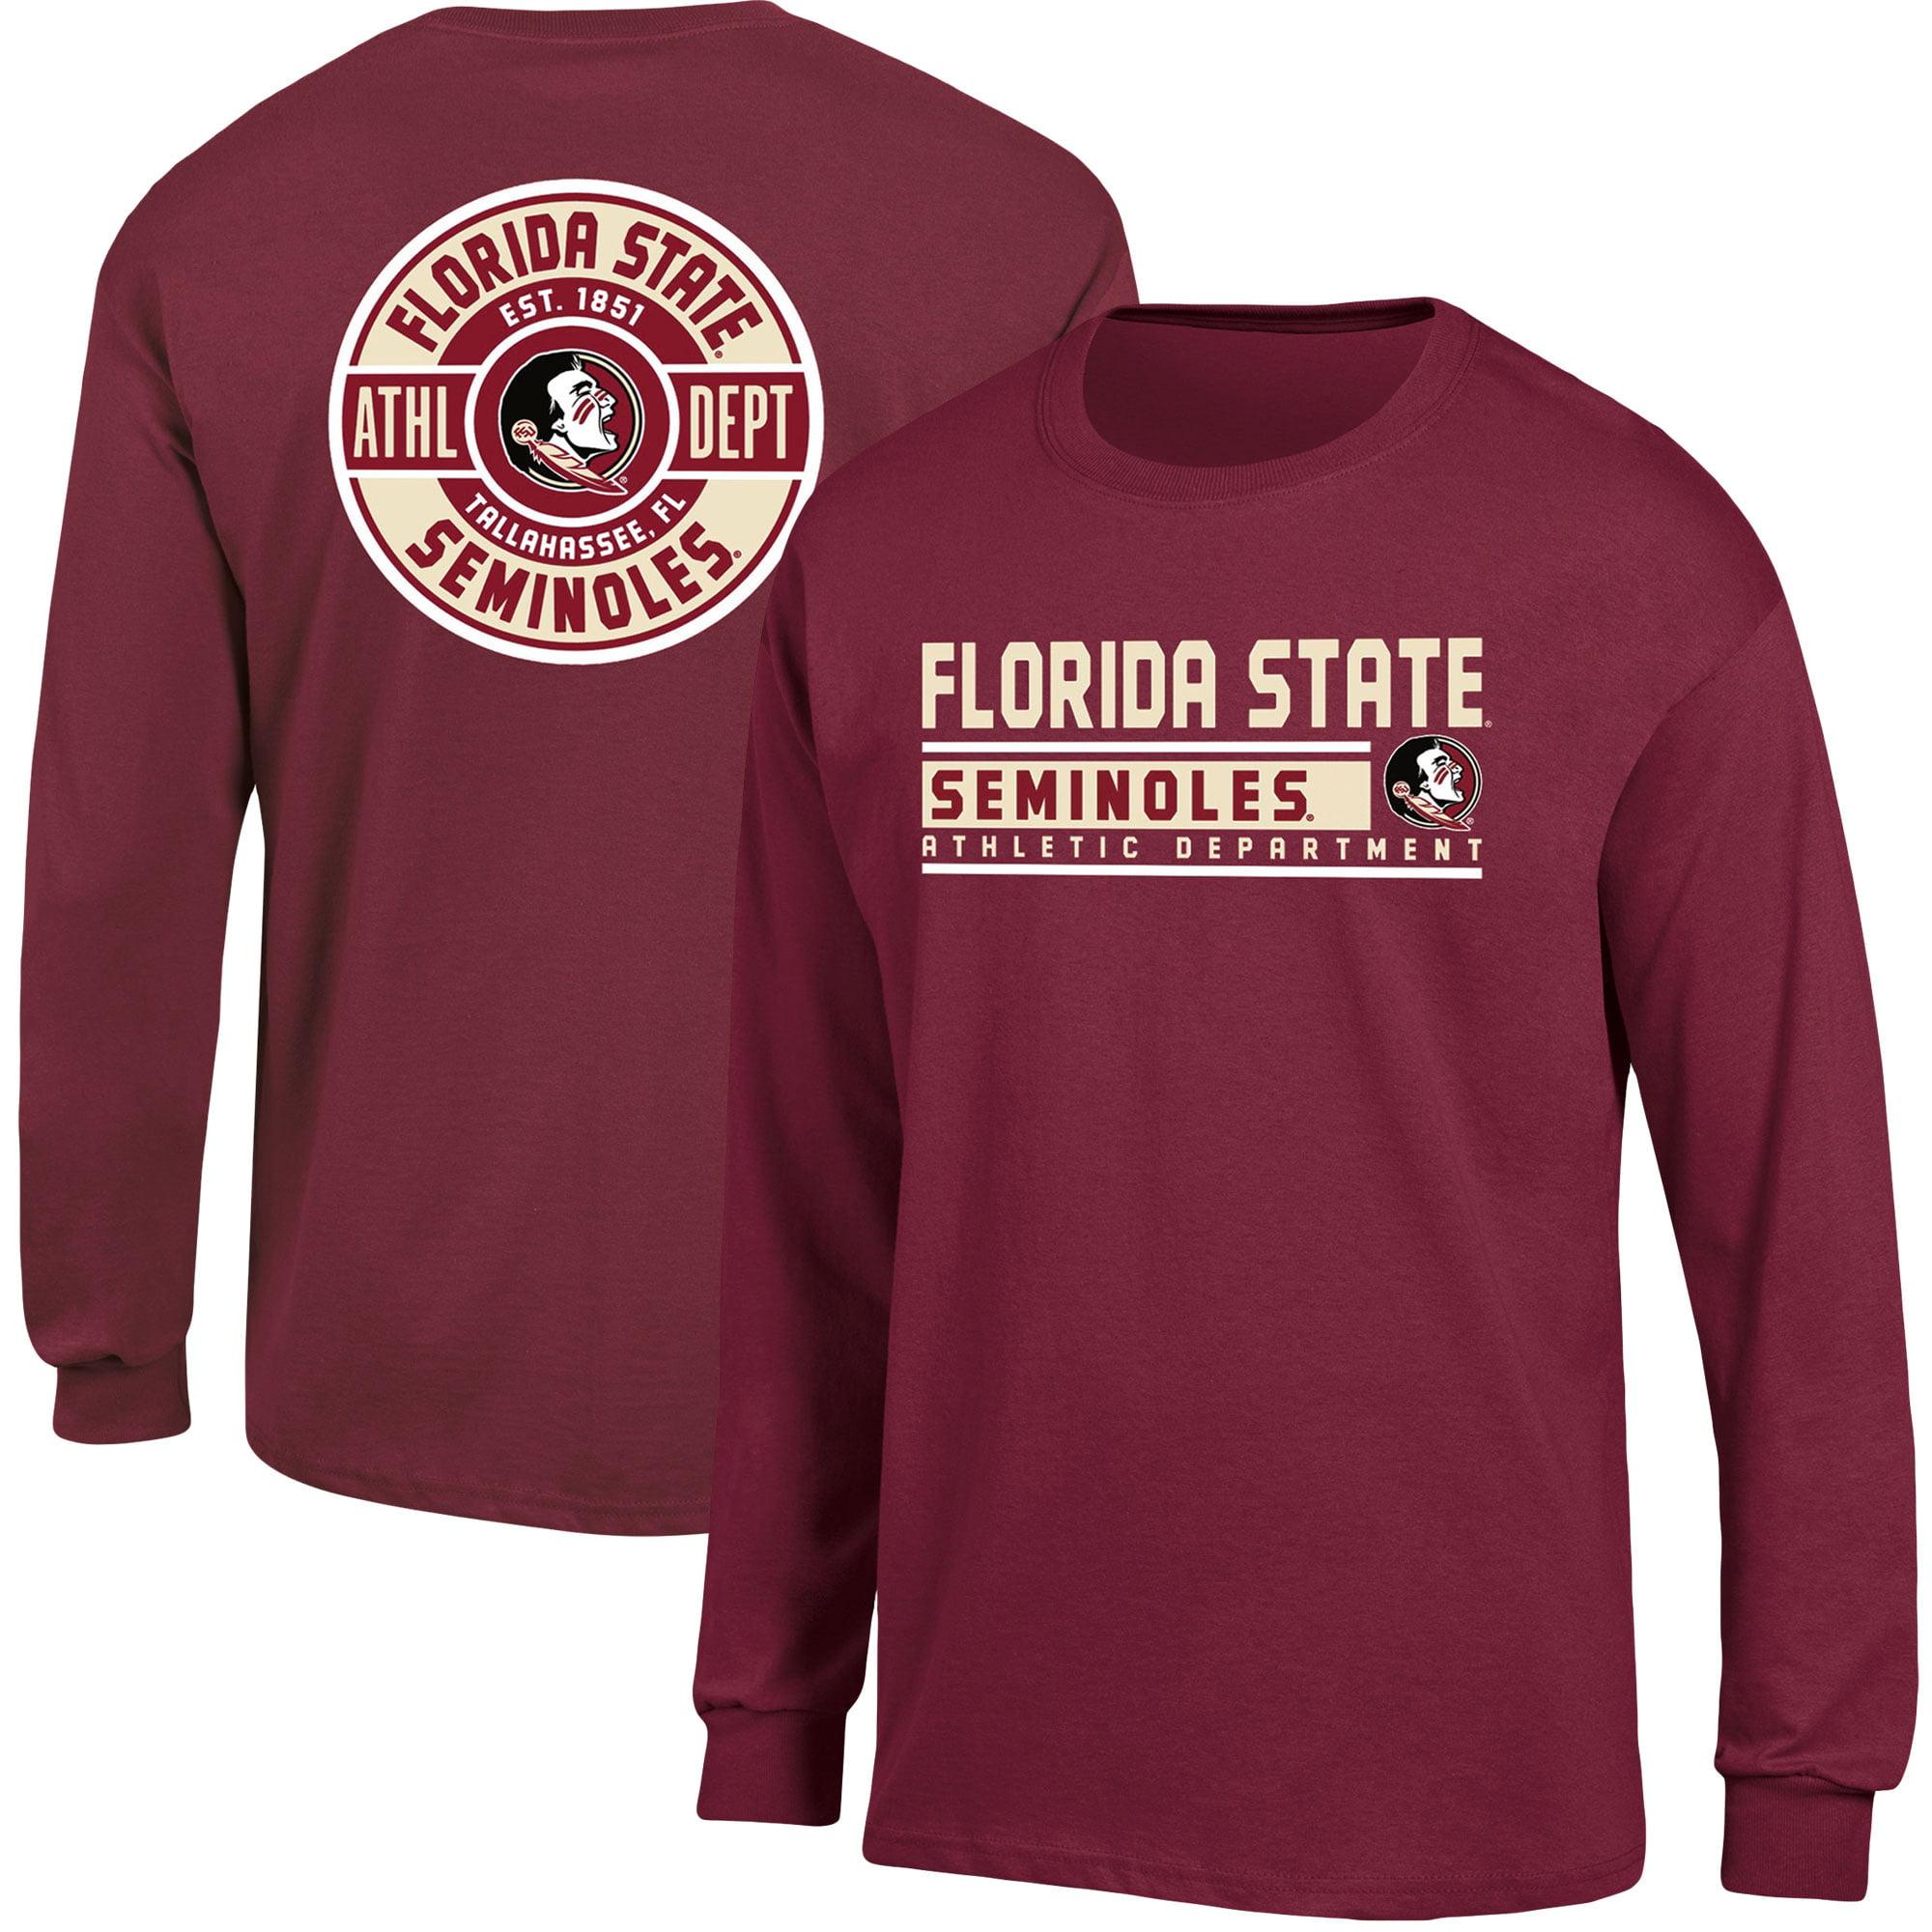 Men's Russell Garnet Florida State Seminoles Back Hit Long Sleeve T-Shirt